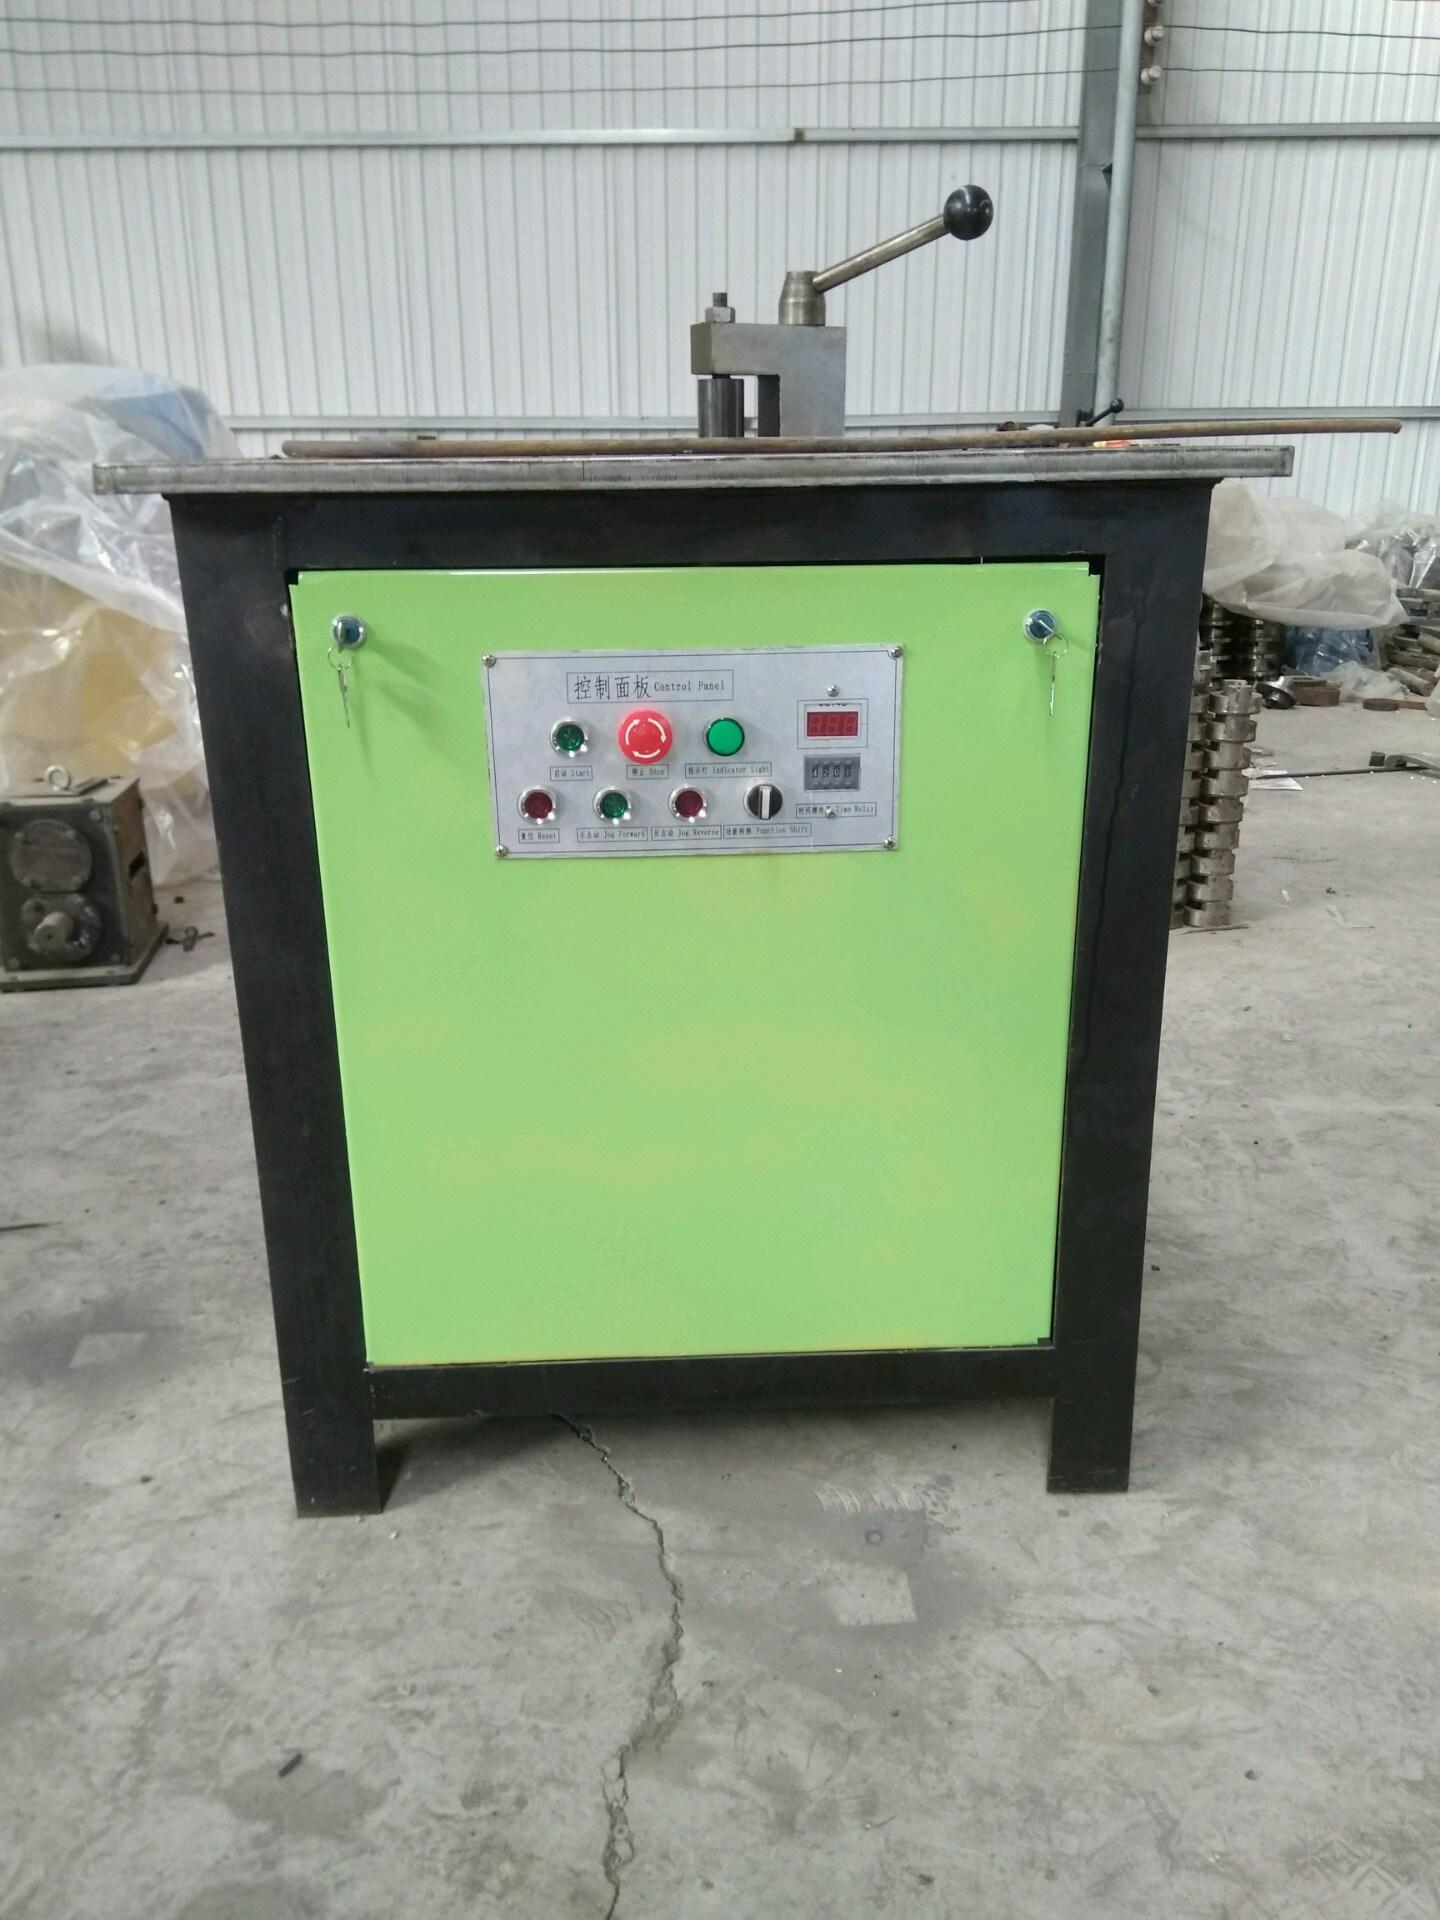 Wrought Iron Bending Machinery /Iron Bending Machine for Flat Iron, Square Steel